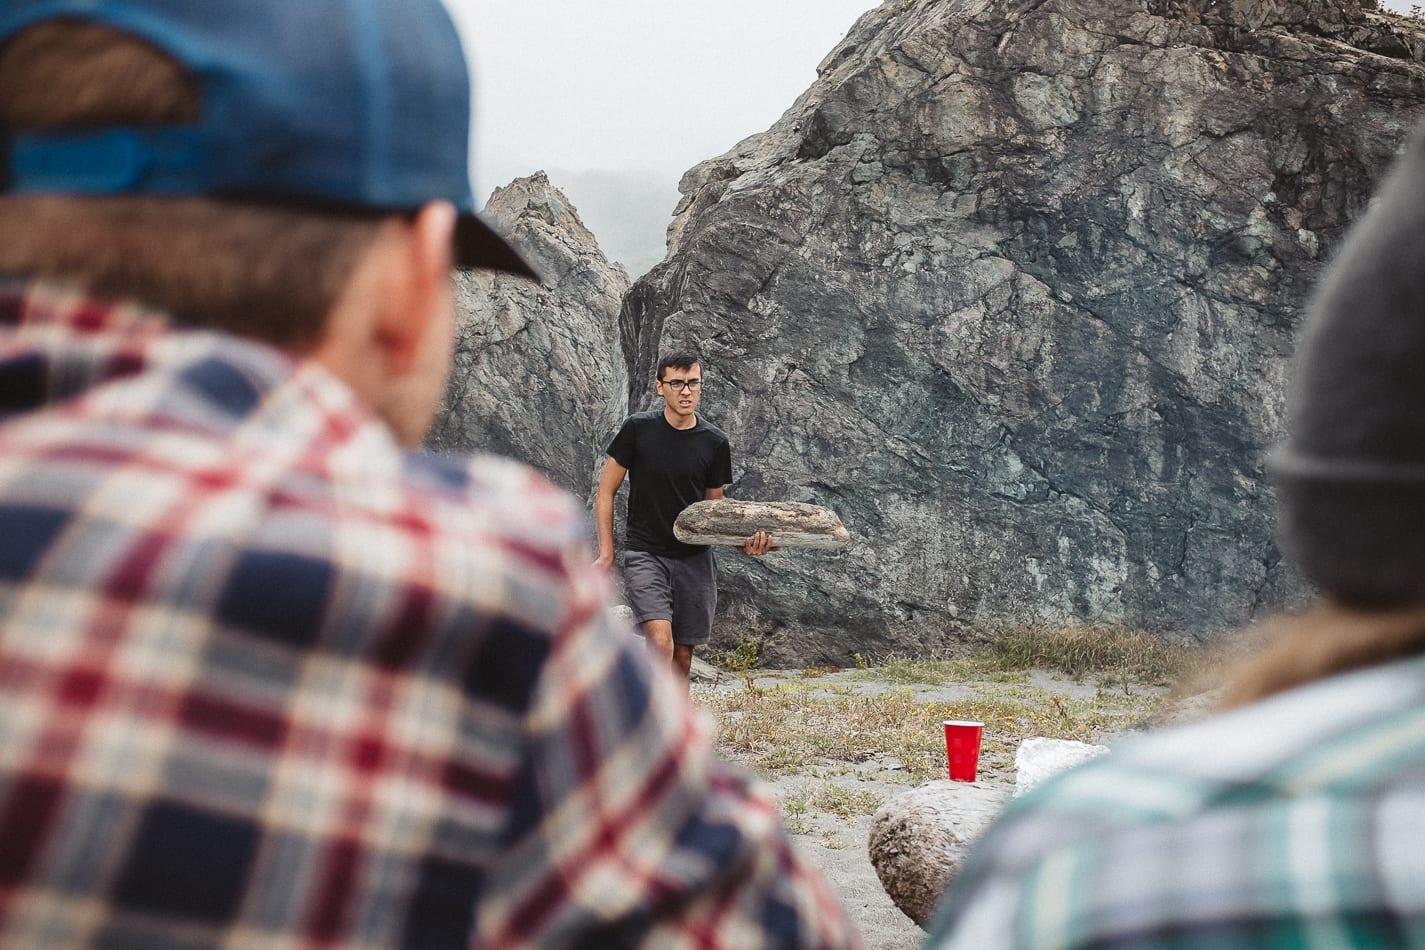 patricks-point-beach-camping-california-adventure-photographer-4